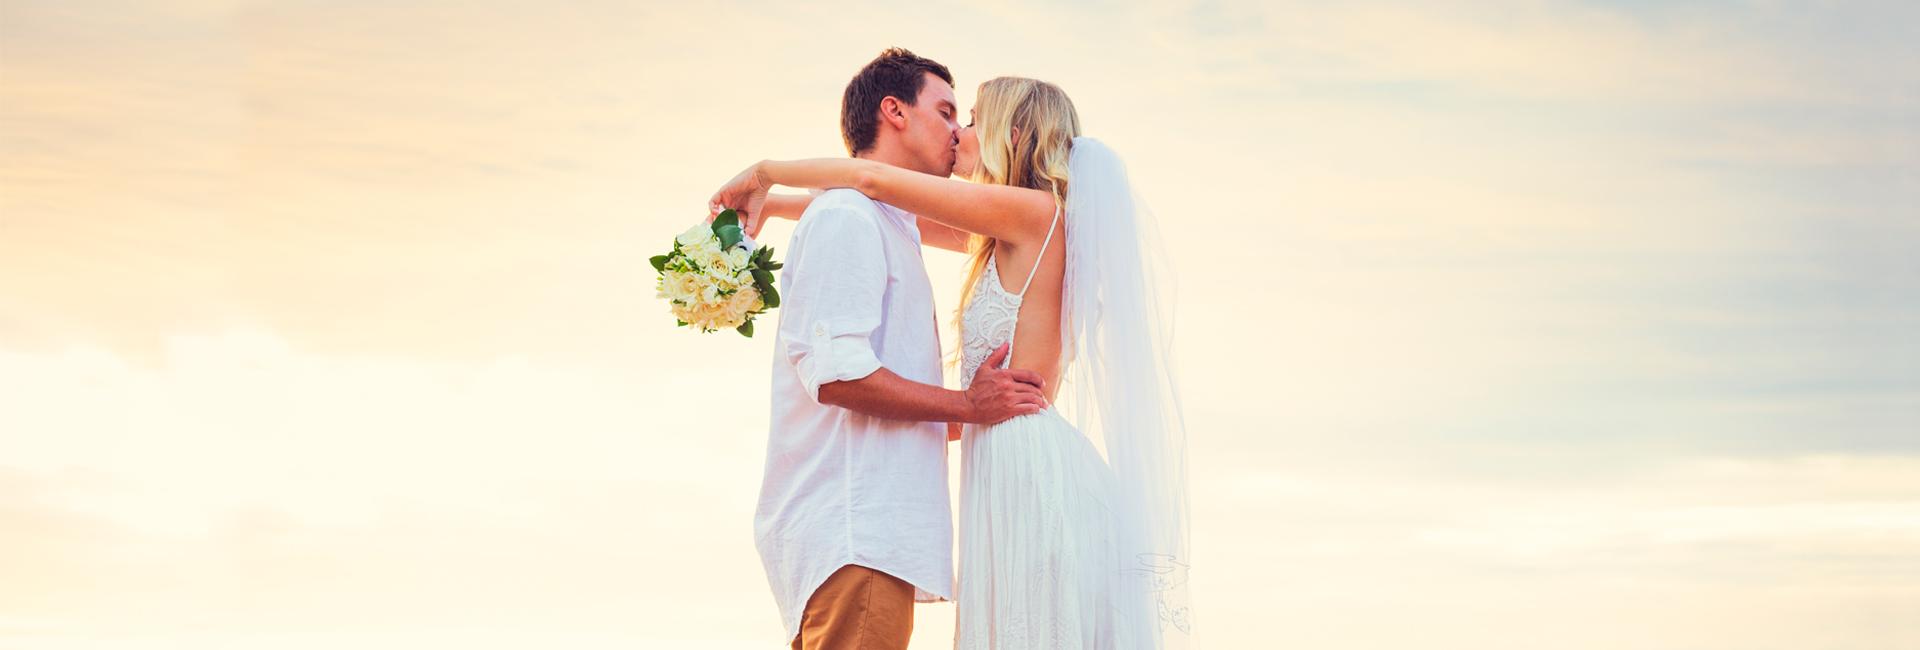 Best wedding venues in puerto vallarta and nuevo vallarta